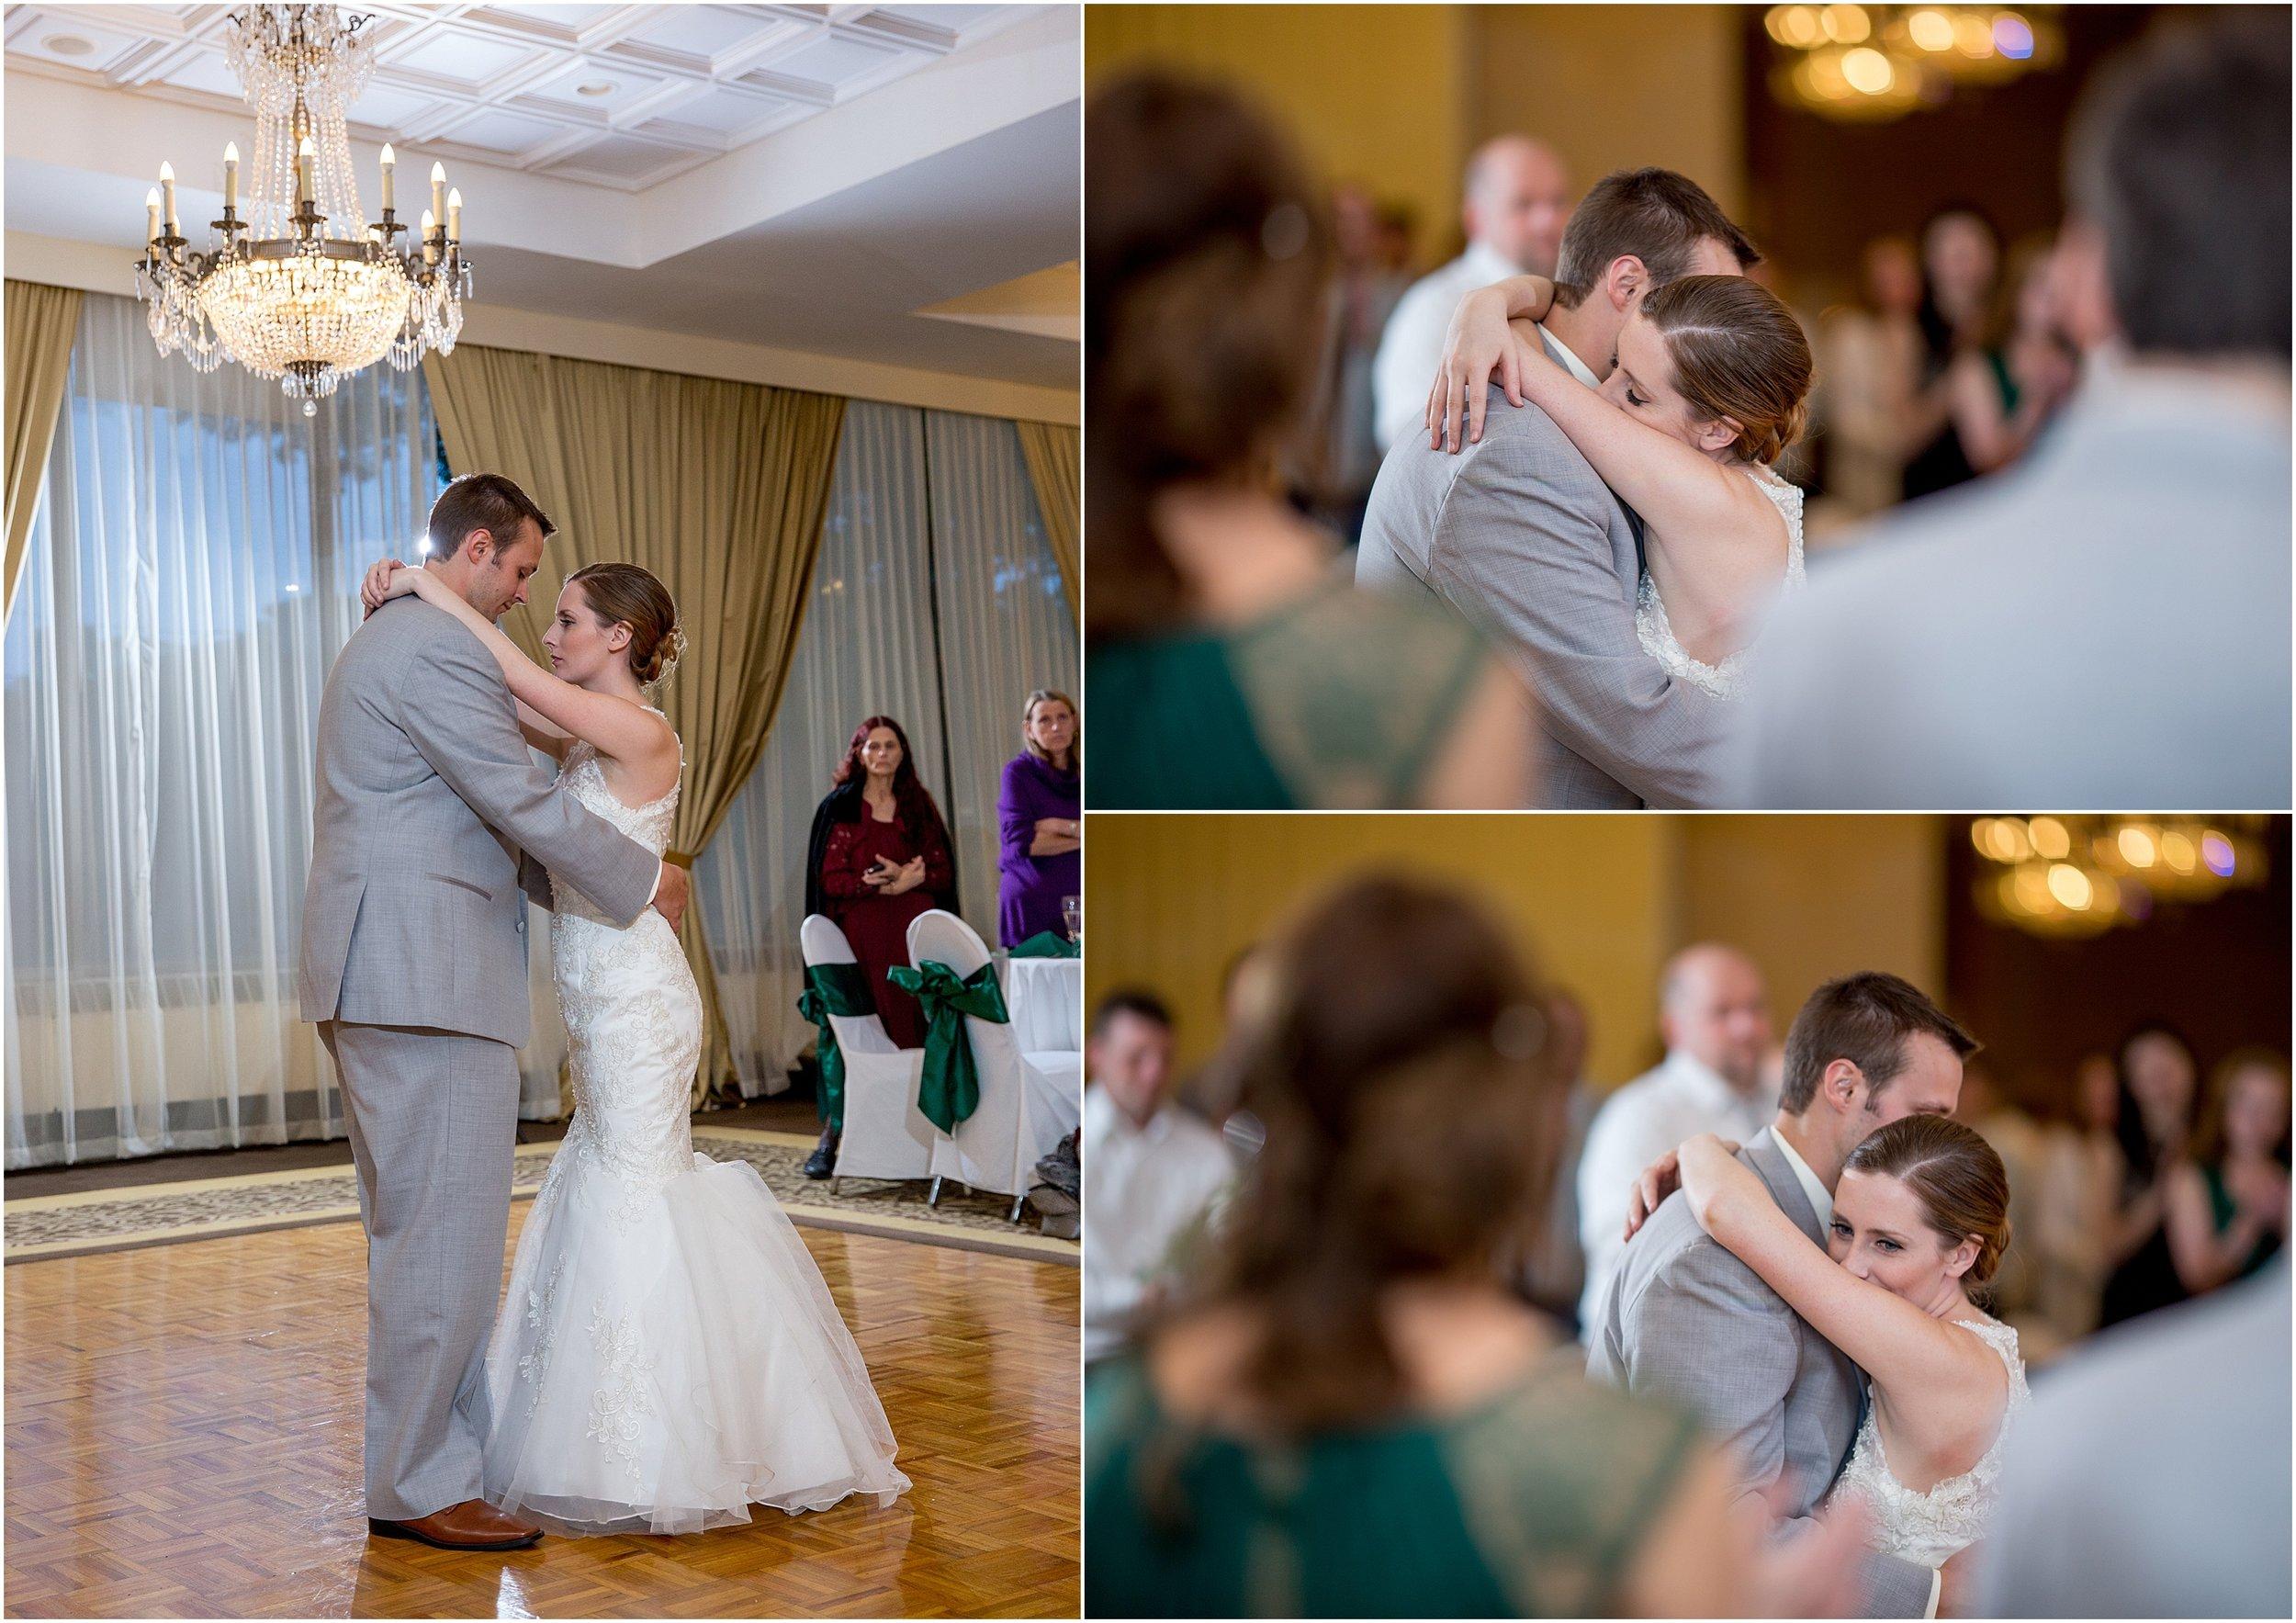 Williamsport_Wedding_0050.jpg